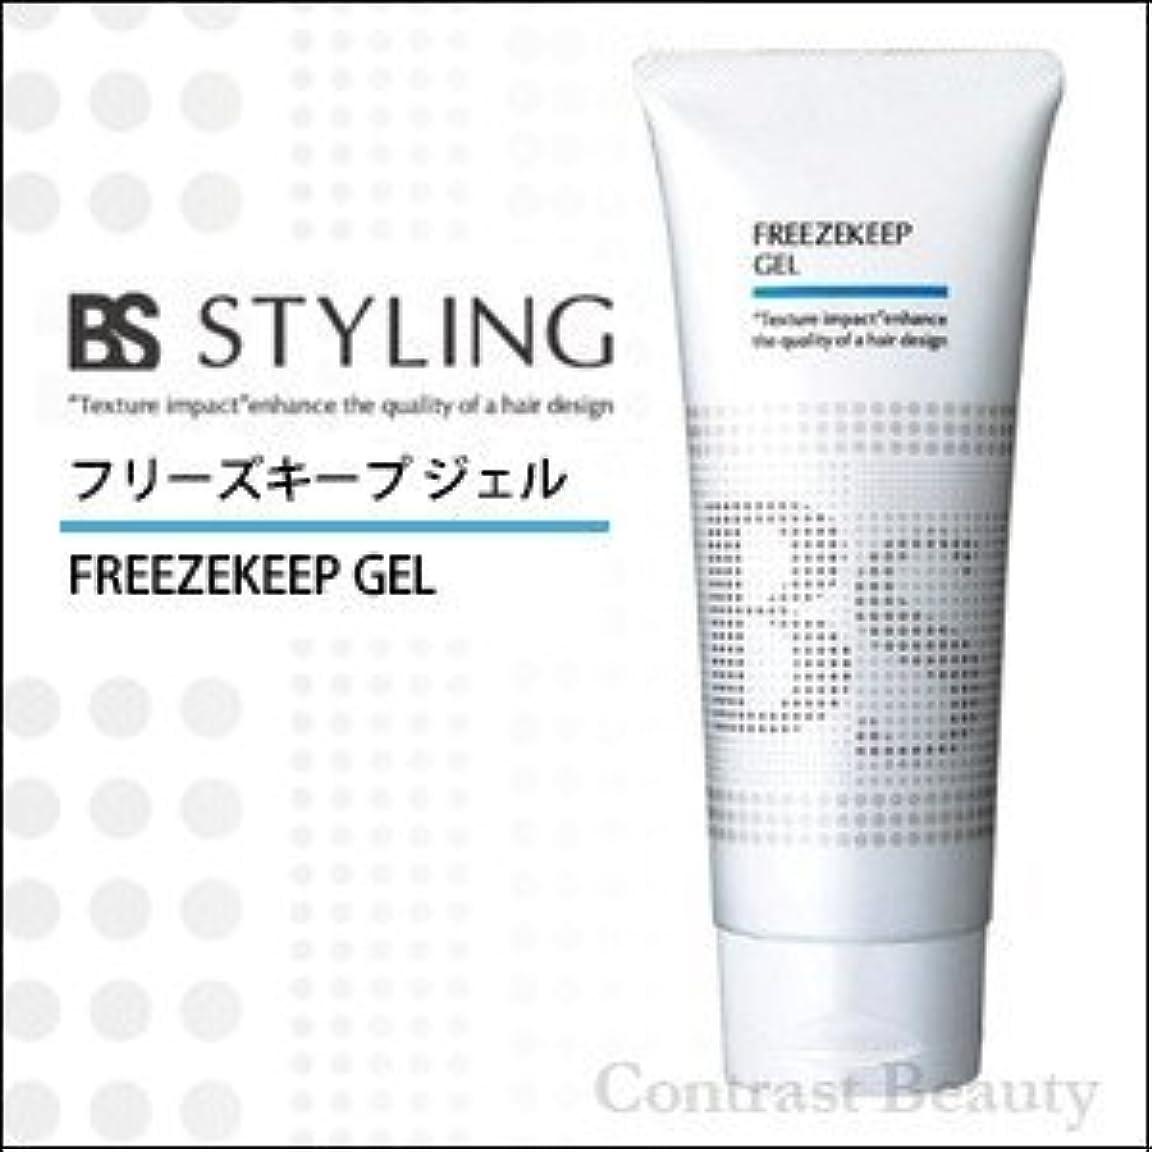 【X2個セット】 アリミノ BSスタイリング フリーズキープ ジェル 200g